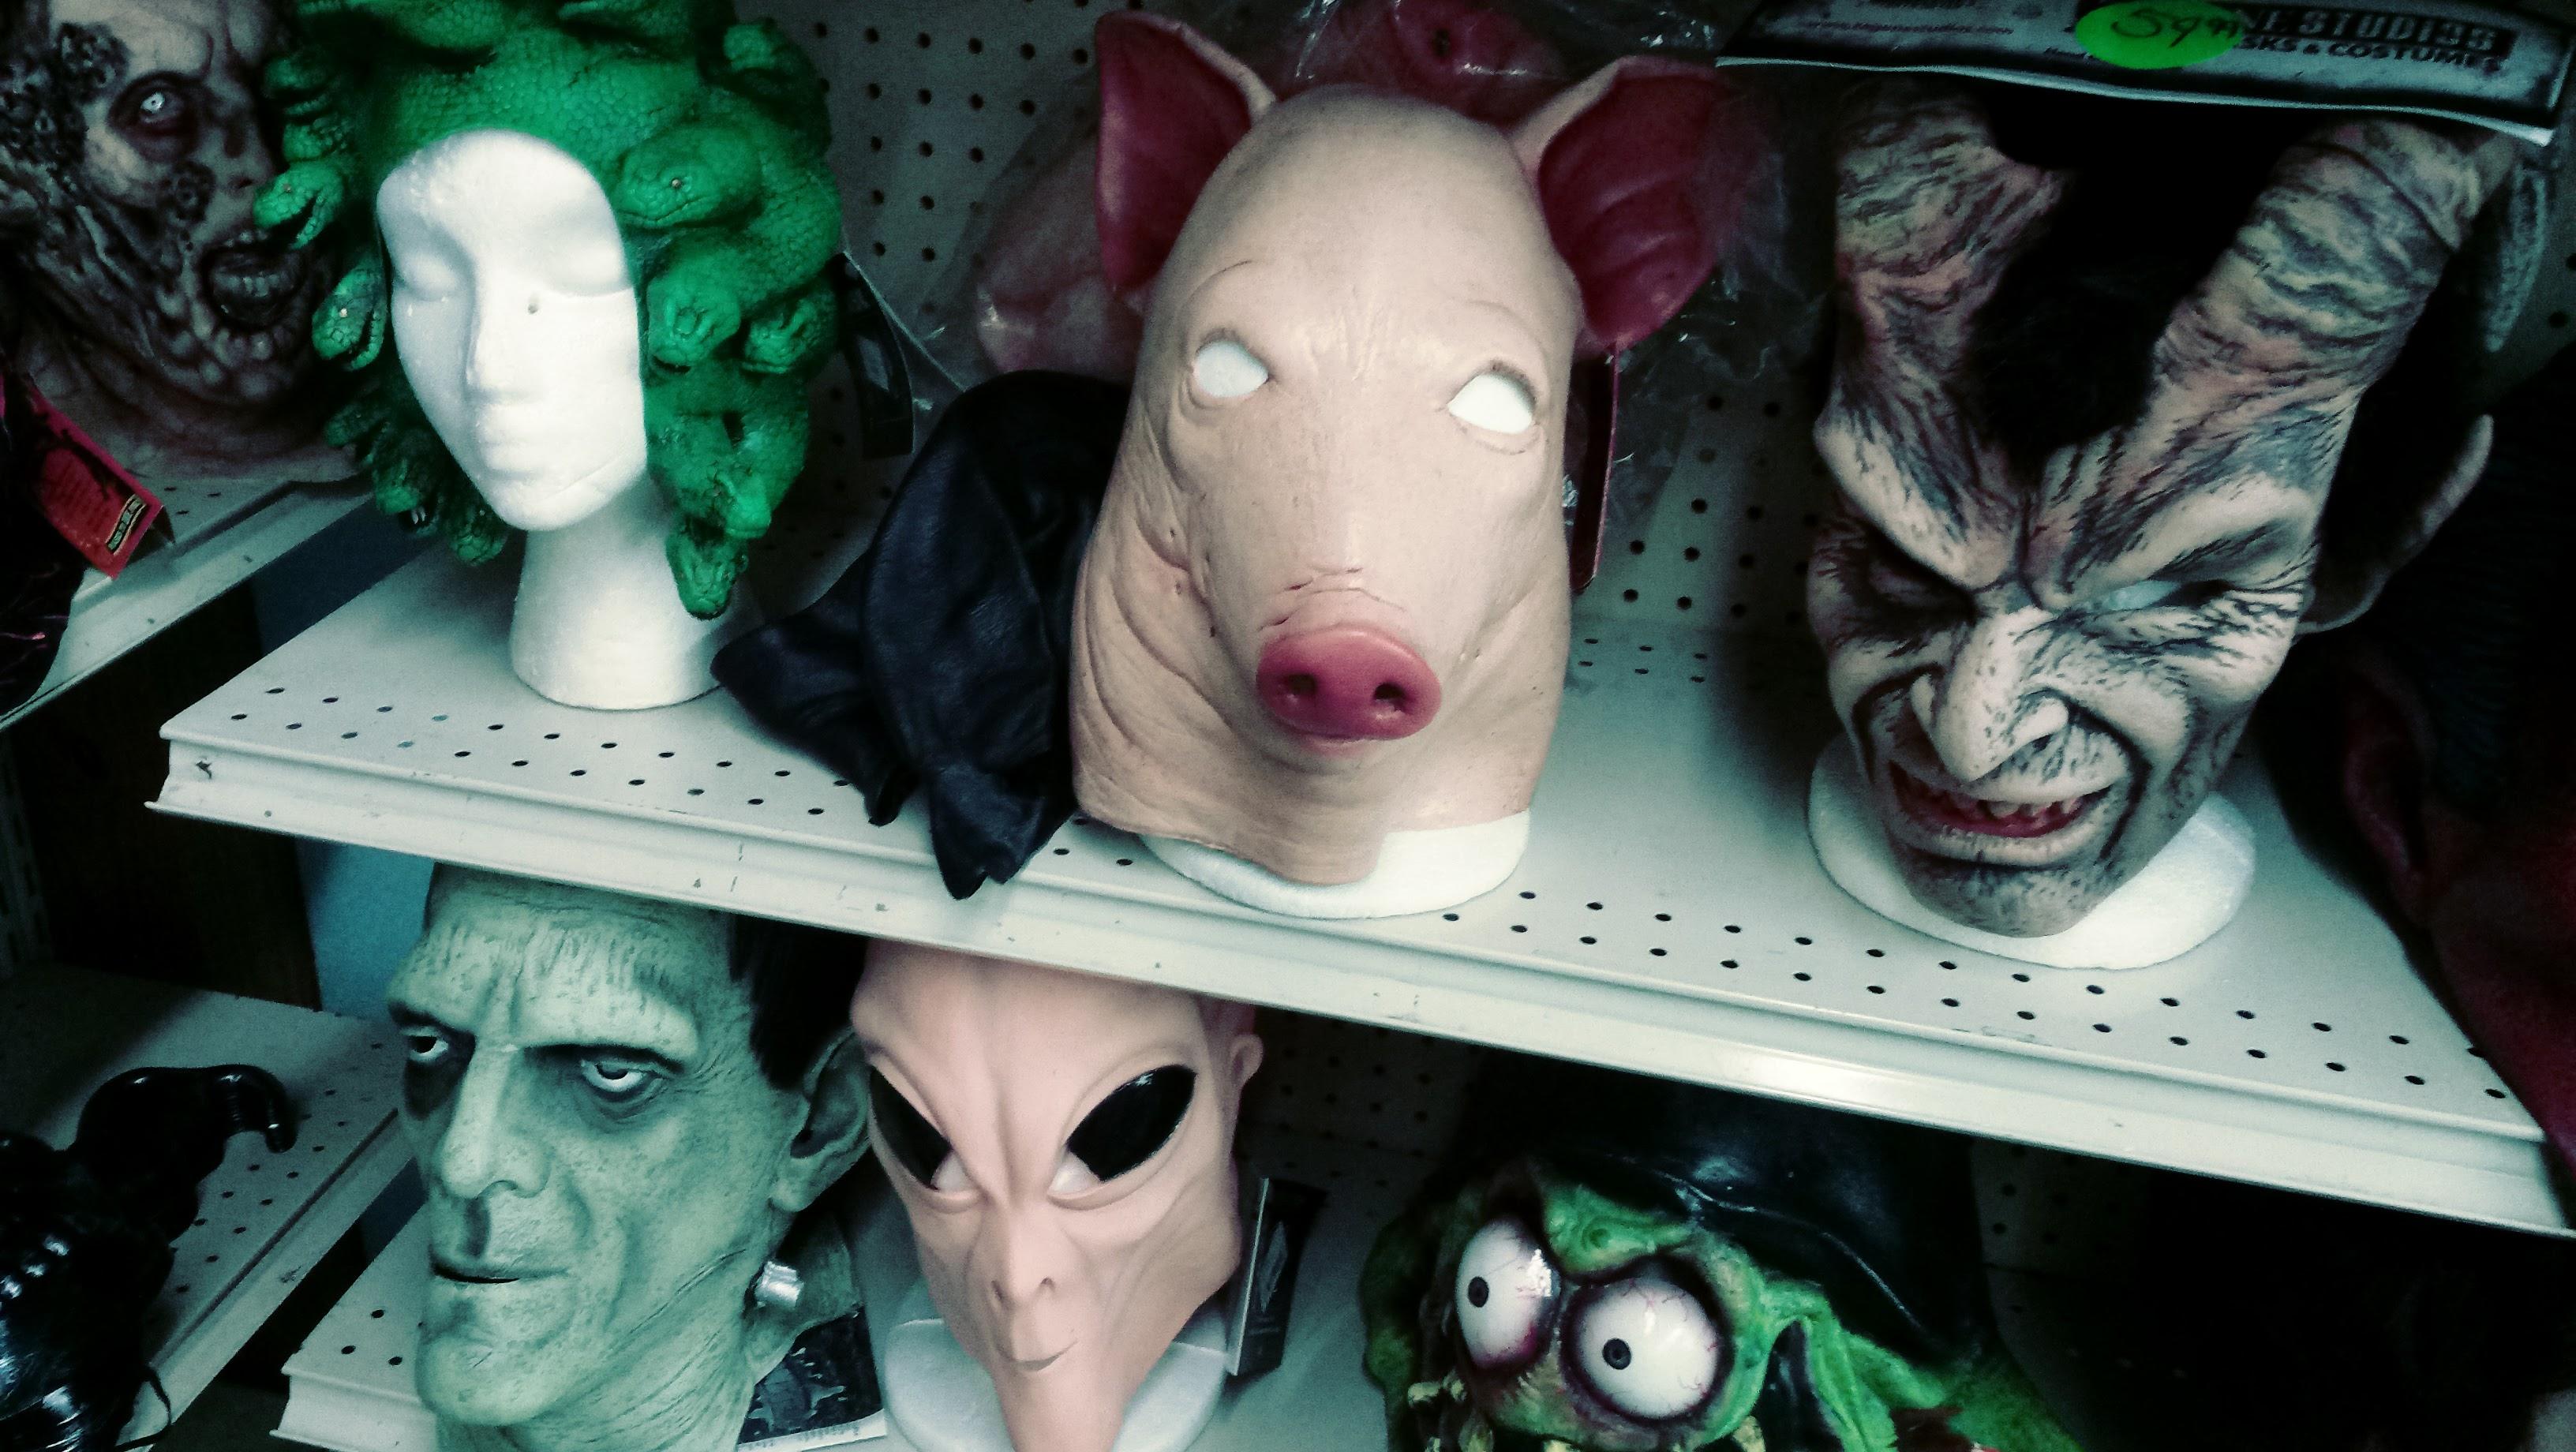 nick nackery alien frankenstein monster ratfink masks